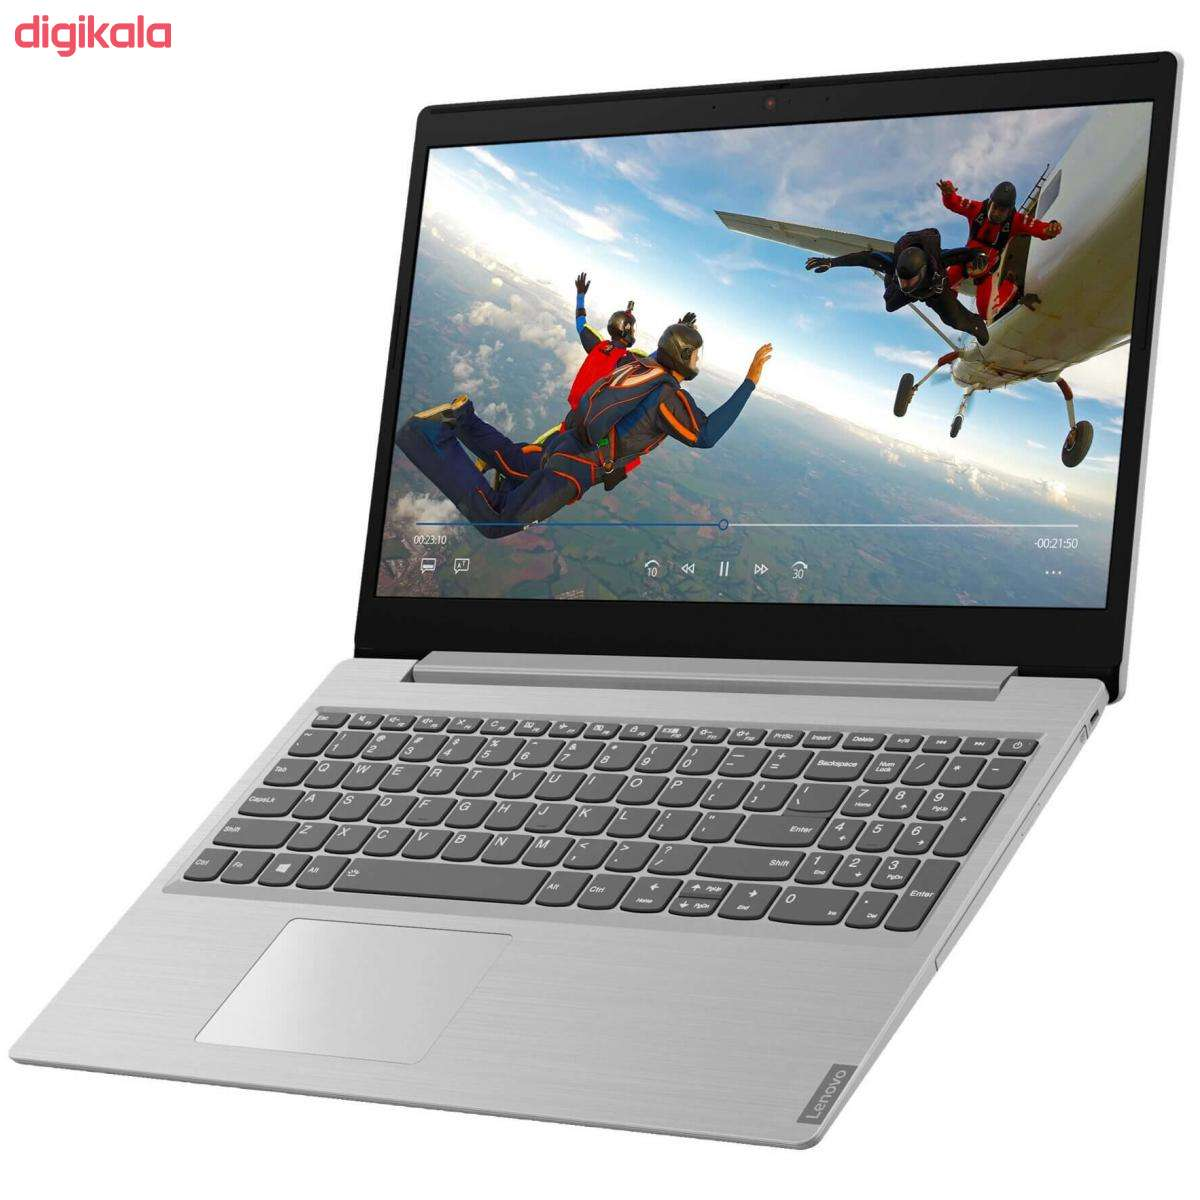 لپ تاپ 15.6 اینچی لنوو مدل Ideapad L3 CEL